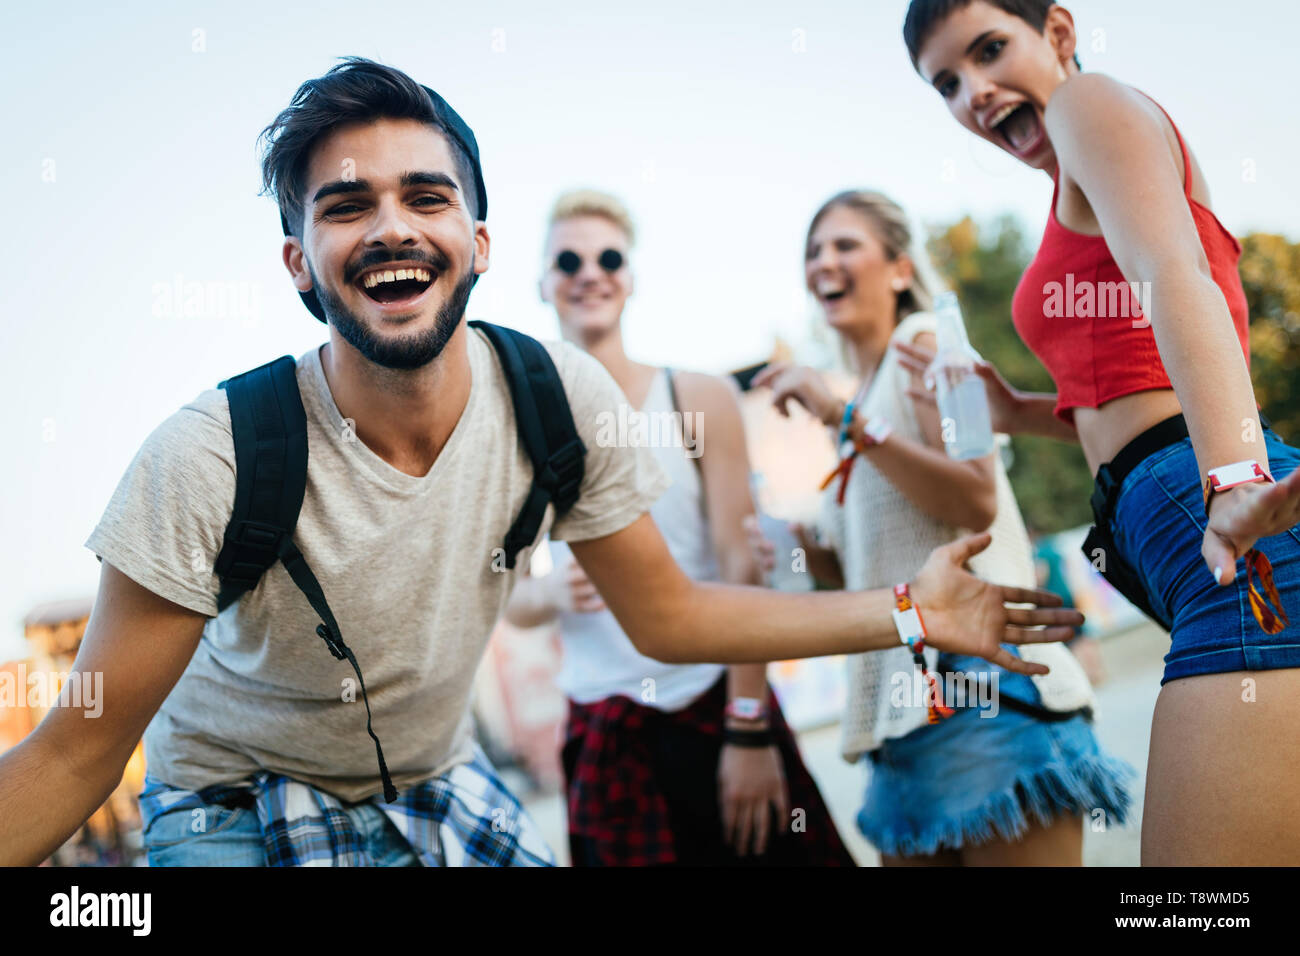 Happy friends having fun at music festival - Stock Image